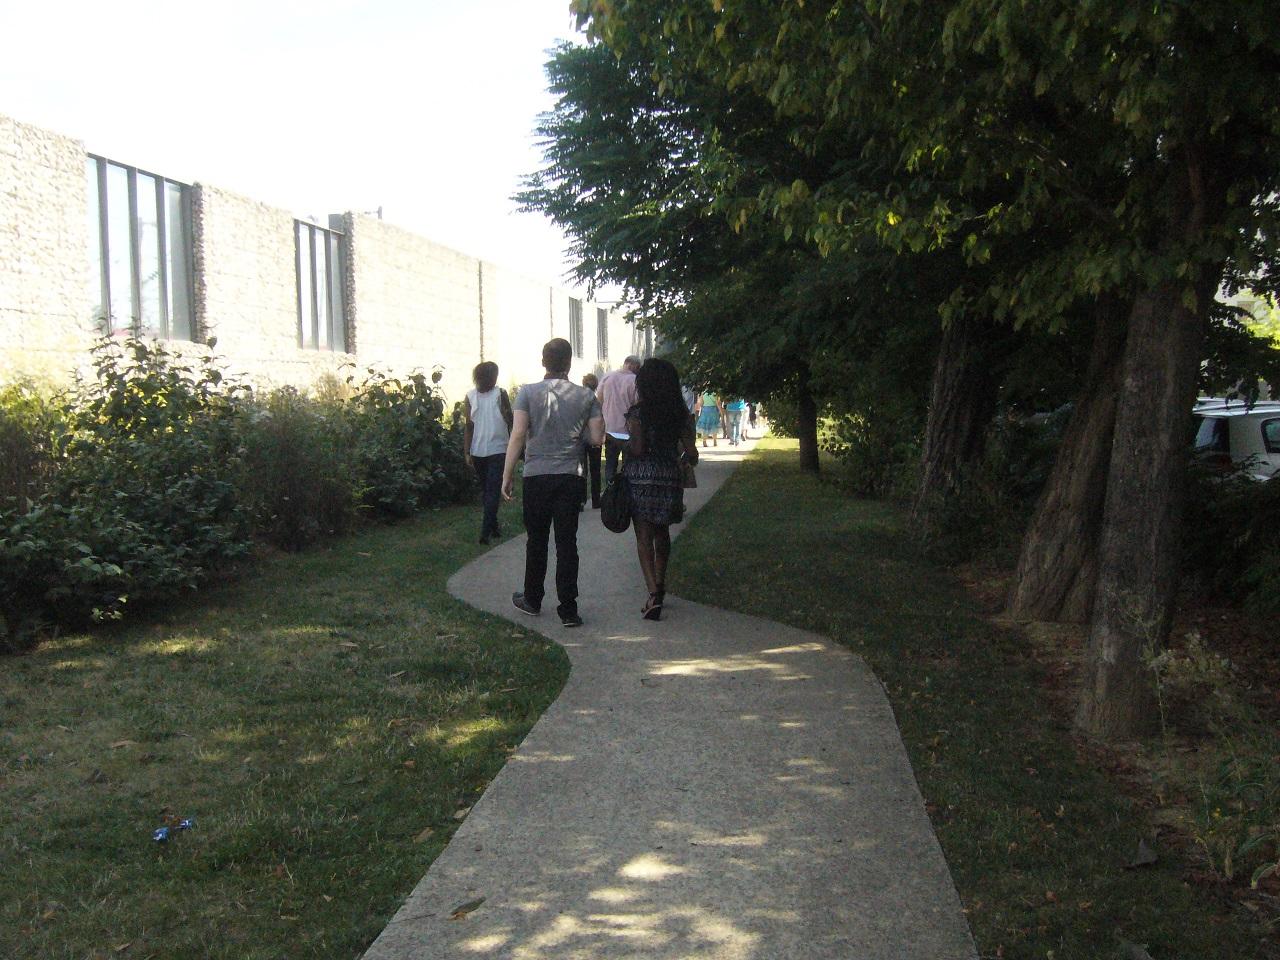 saint denis 9 promenade sante.jpg